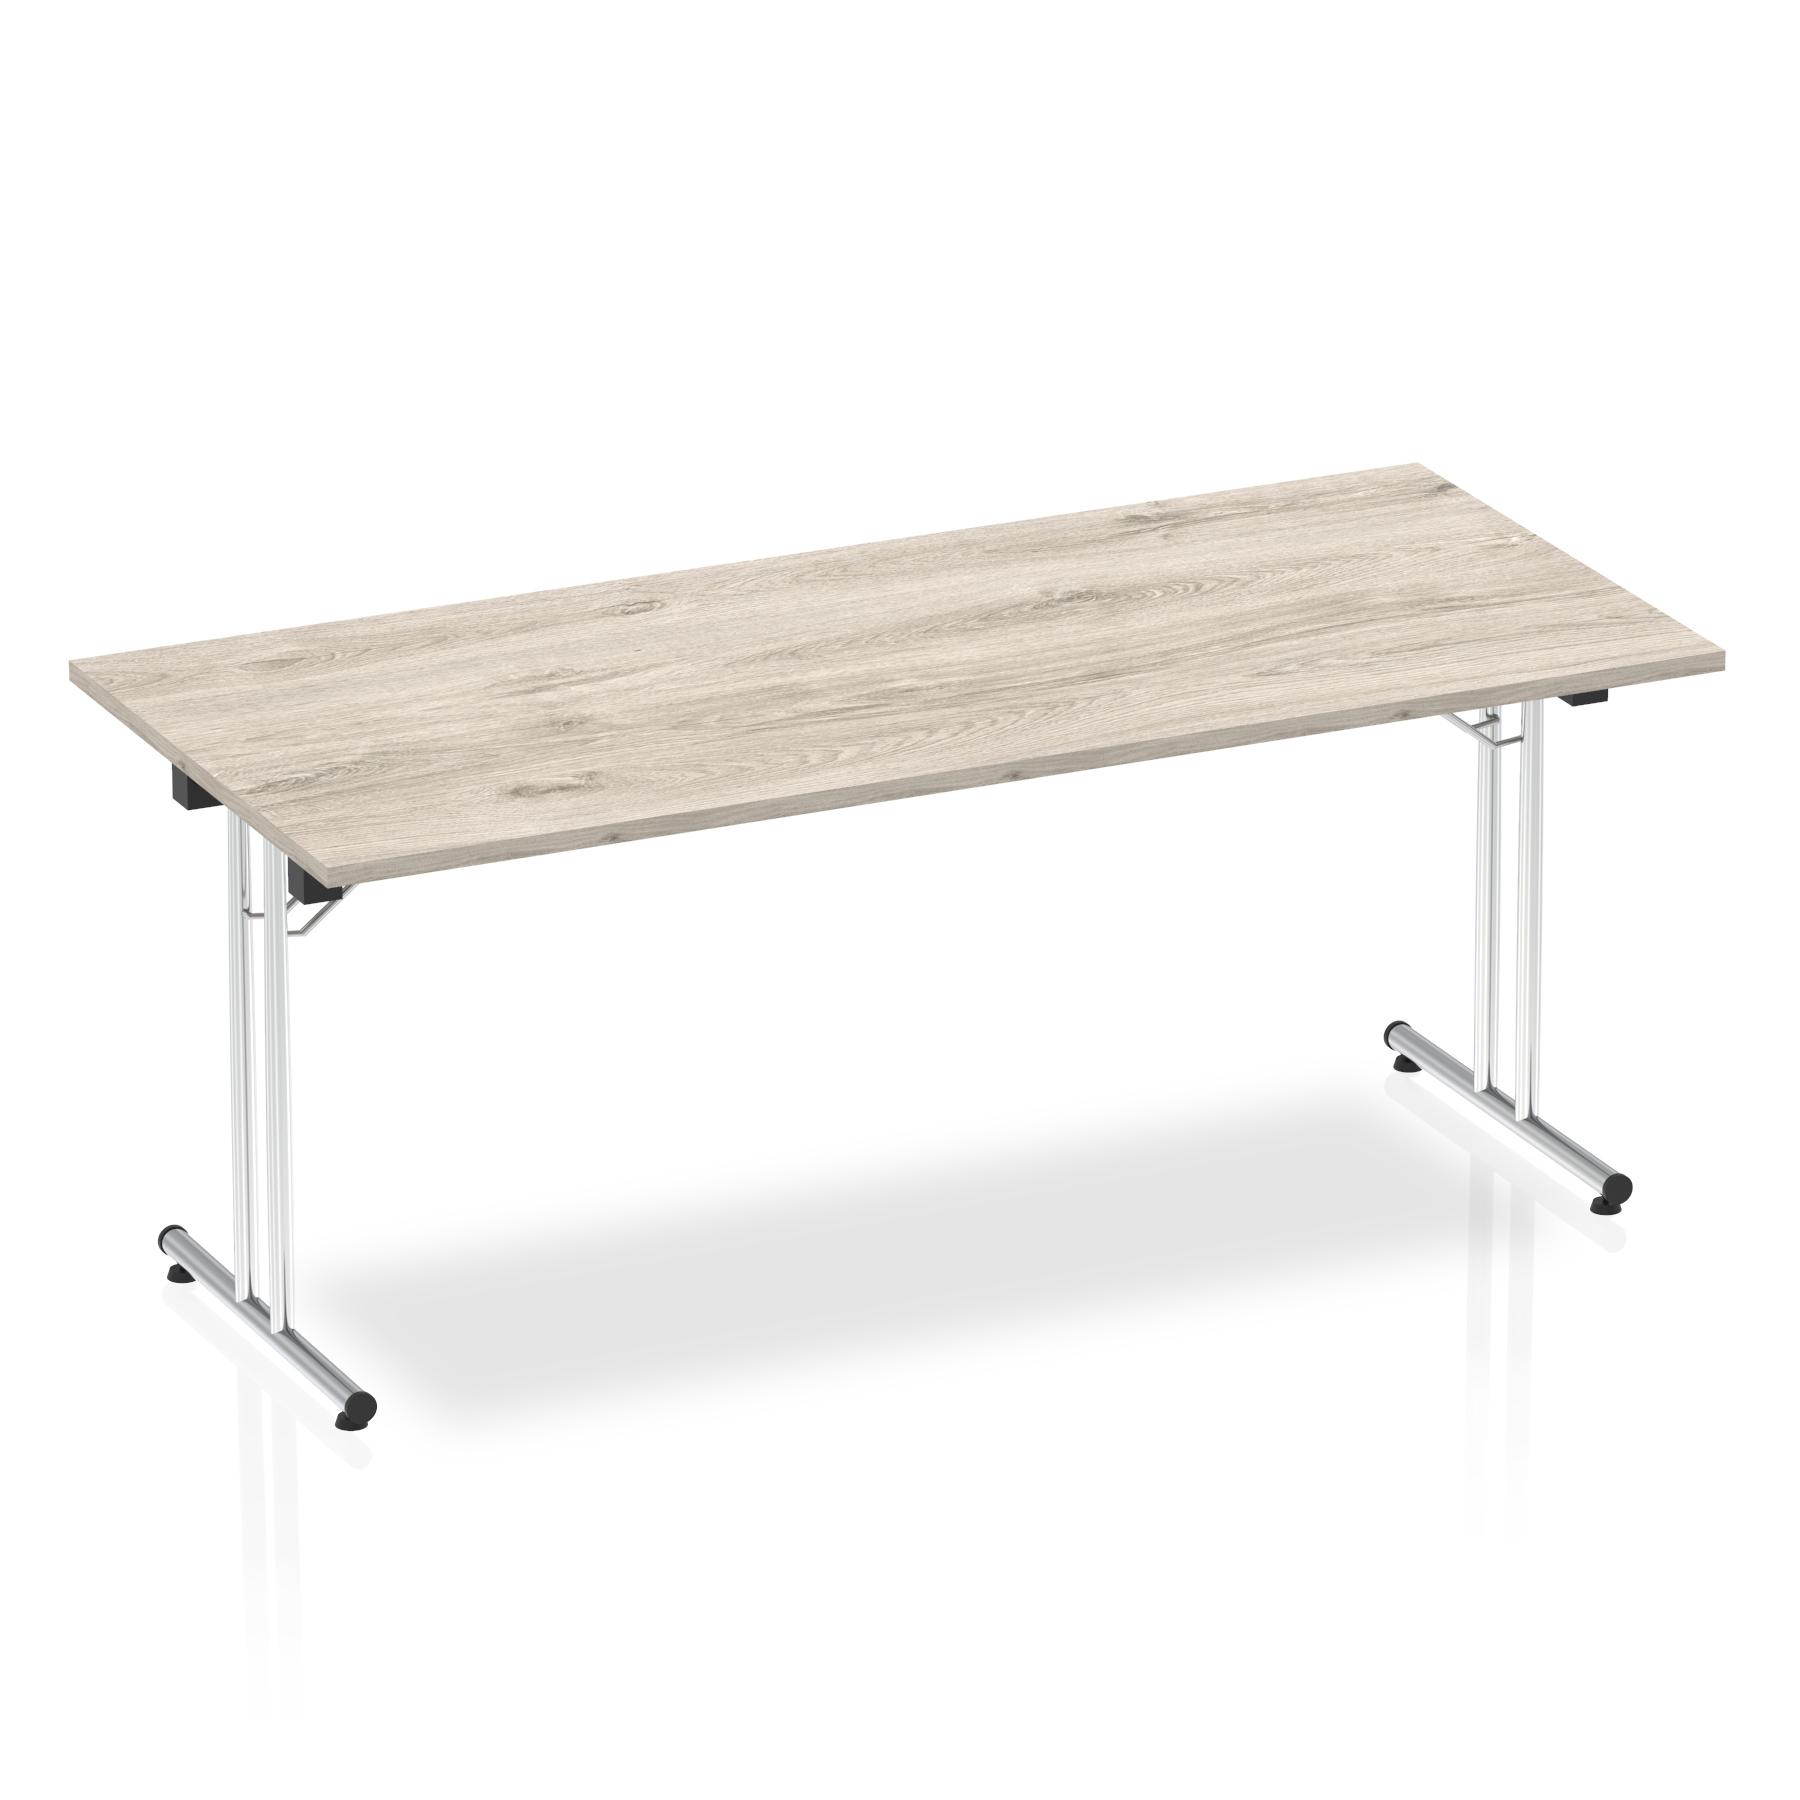 Sonix Rectangular Chrome Leg Folding Meeting Table 1800x800mm Grey Oak Ref